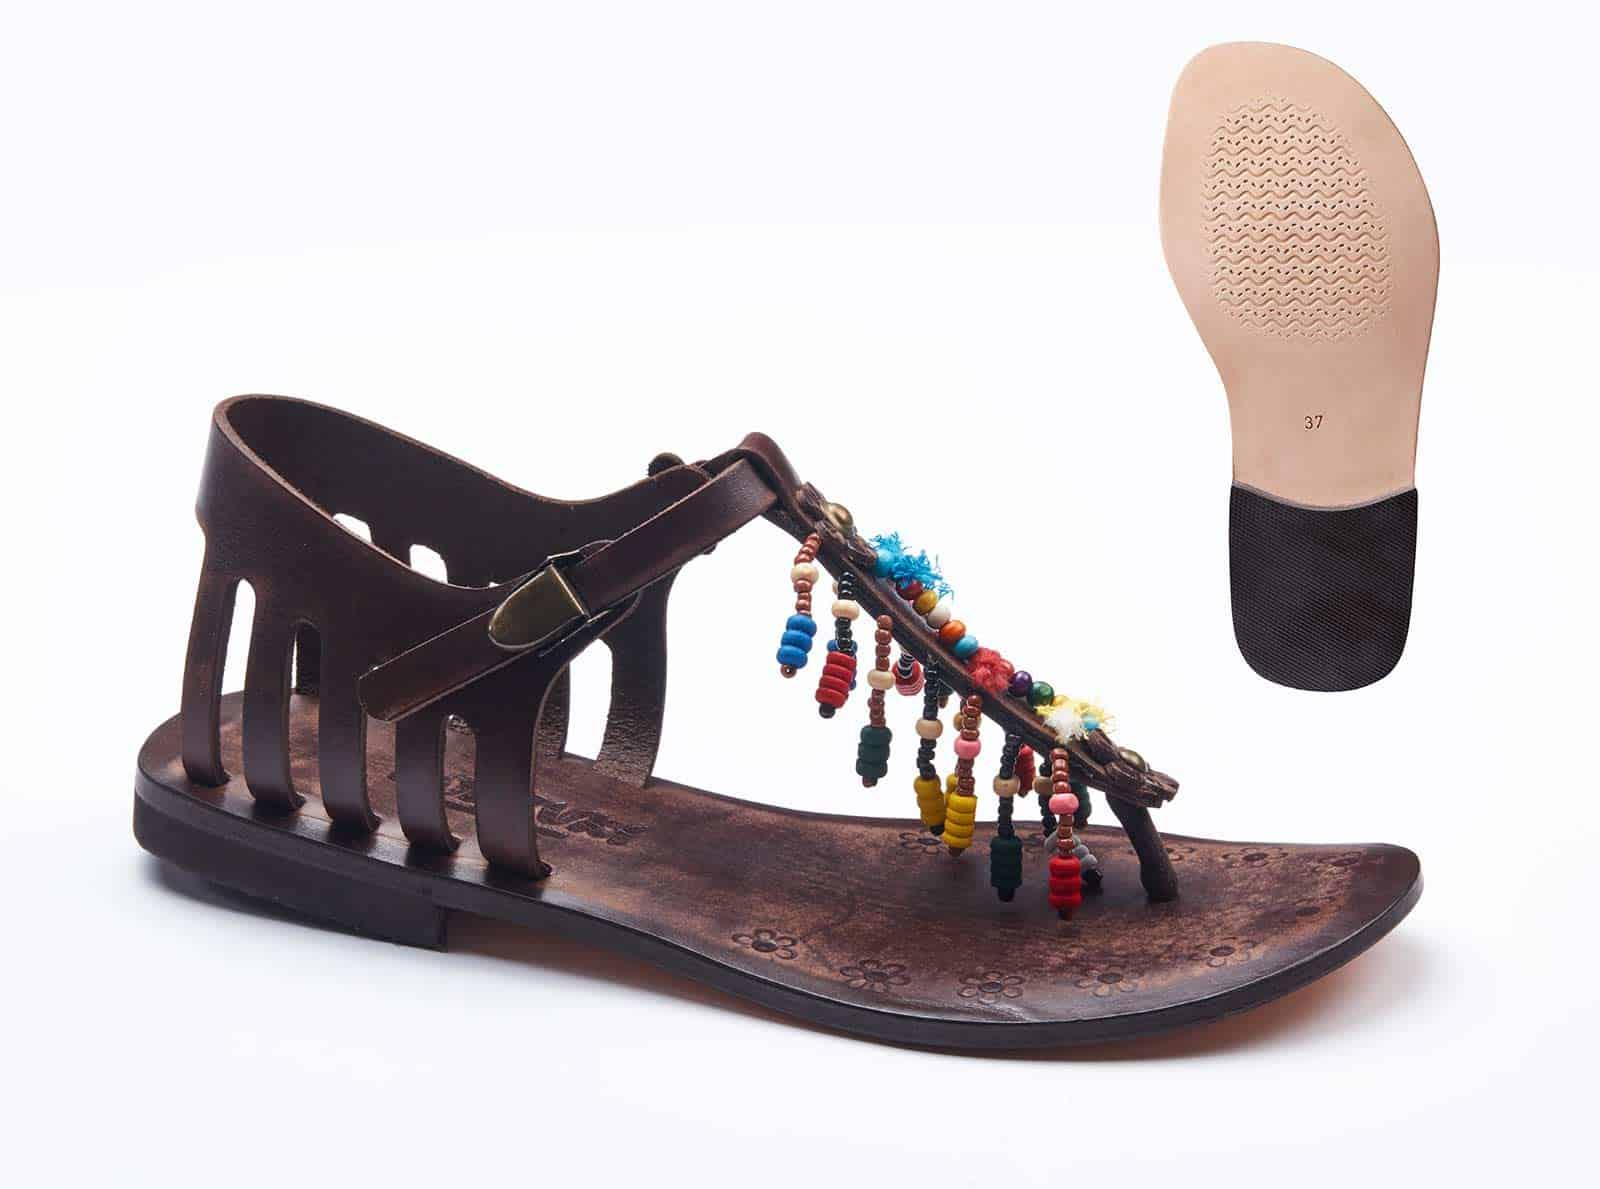 ee4d1405a3d223 Bodrum Sandals. Bodrum Sandals have been popular handmade leather ...